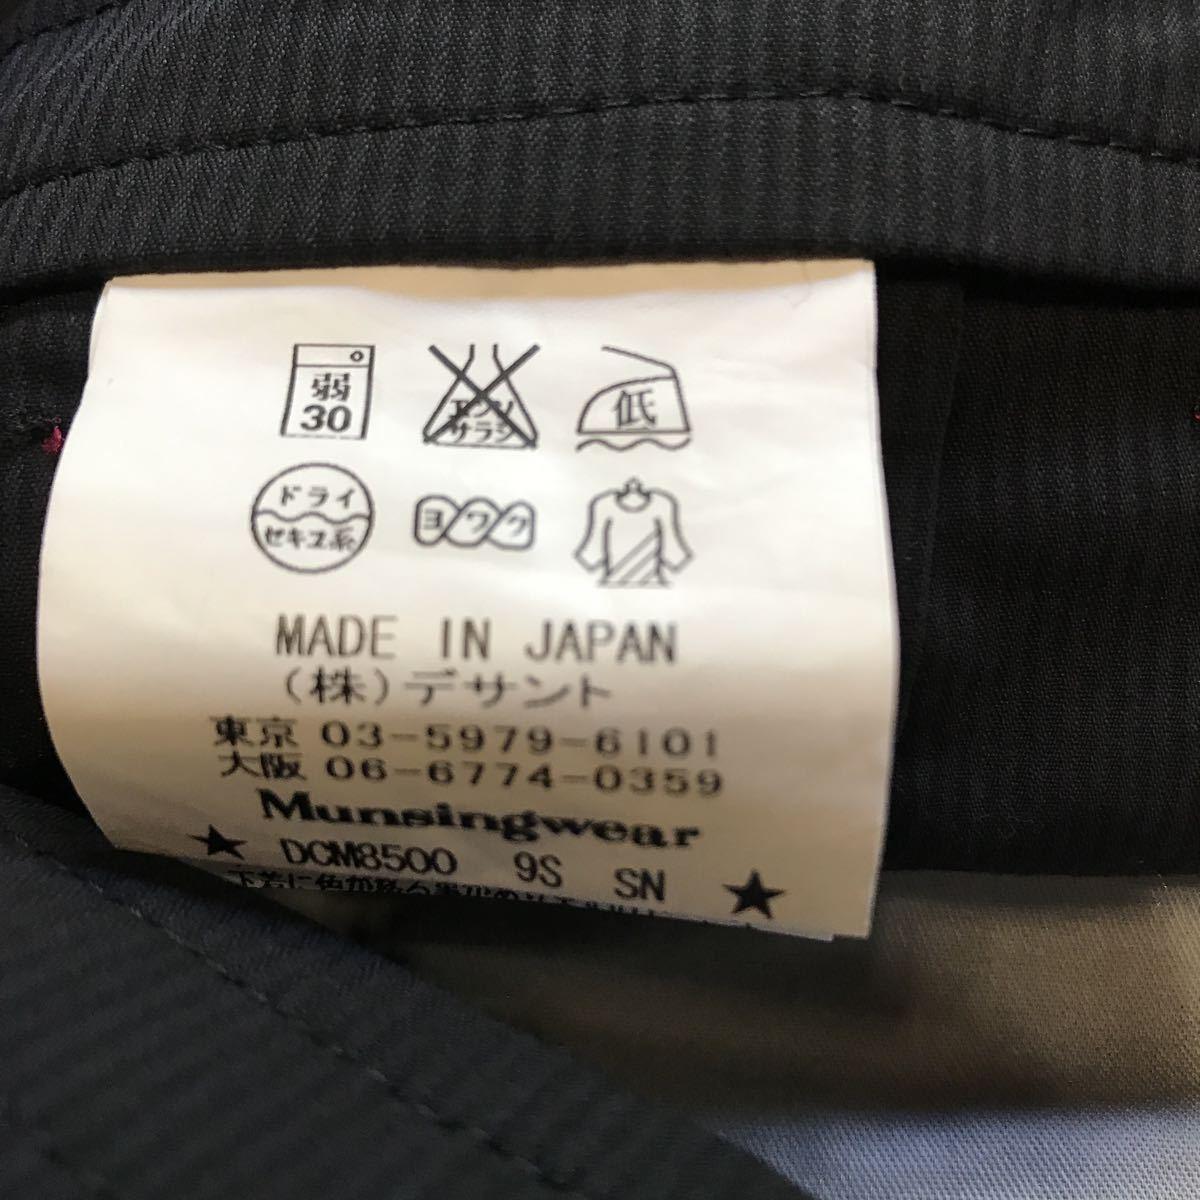 W2F黒b マンシングウェア デサント ハーフパンツ 日本製 ゴルフウェア パンツ_画像4